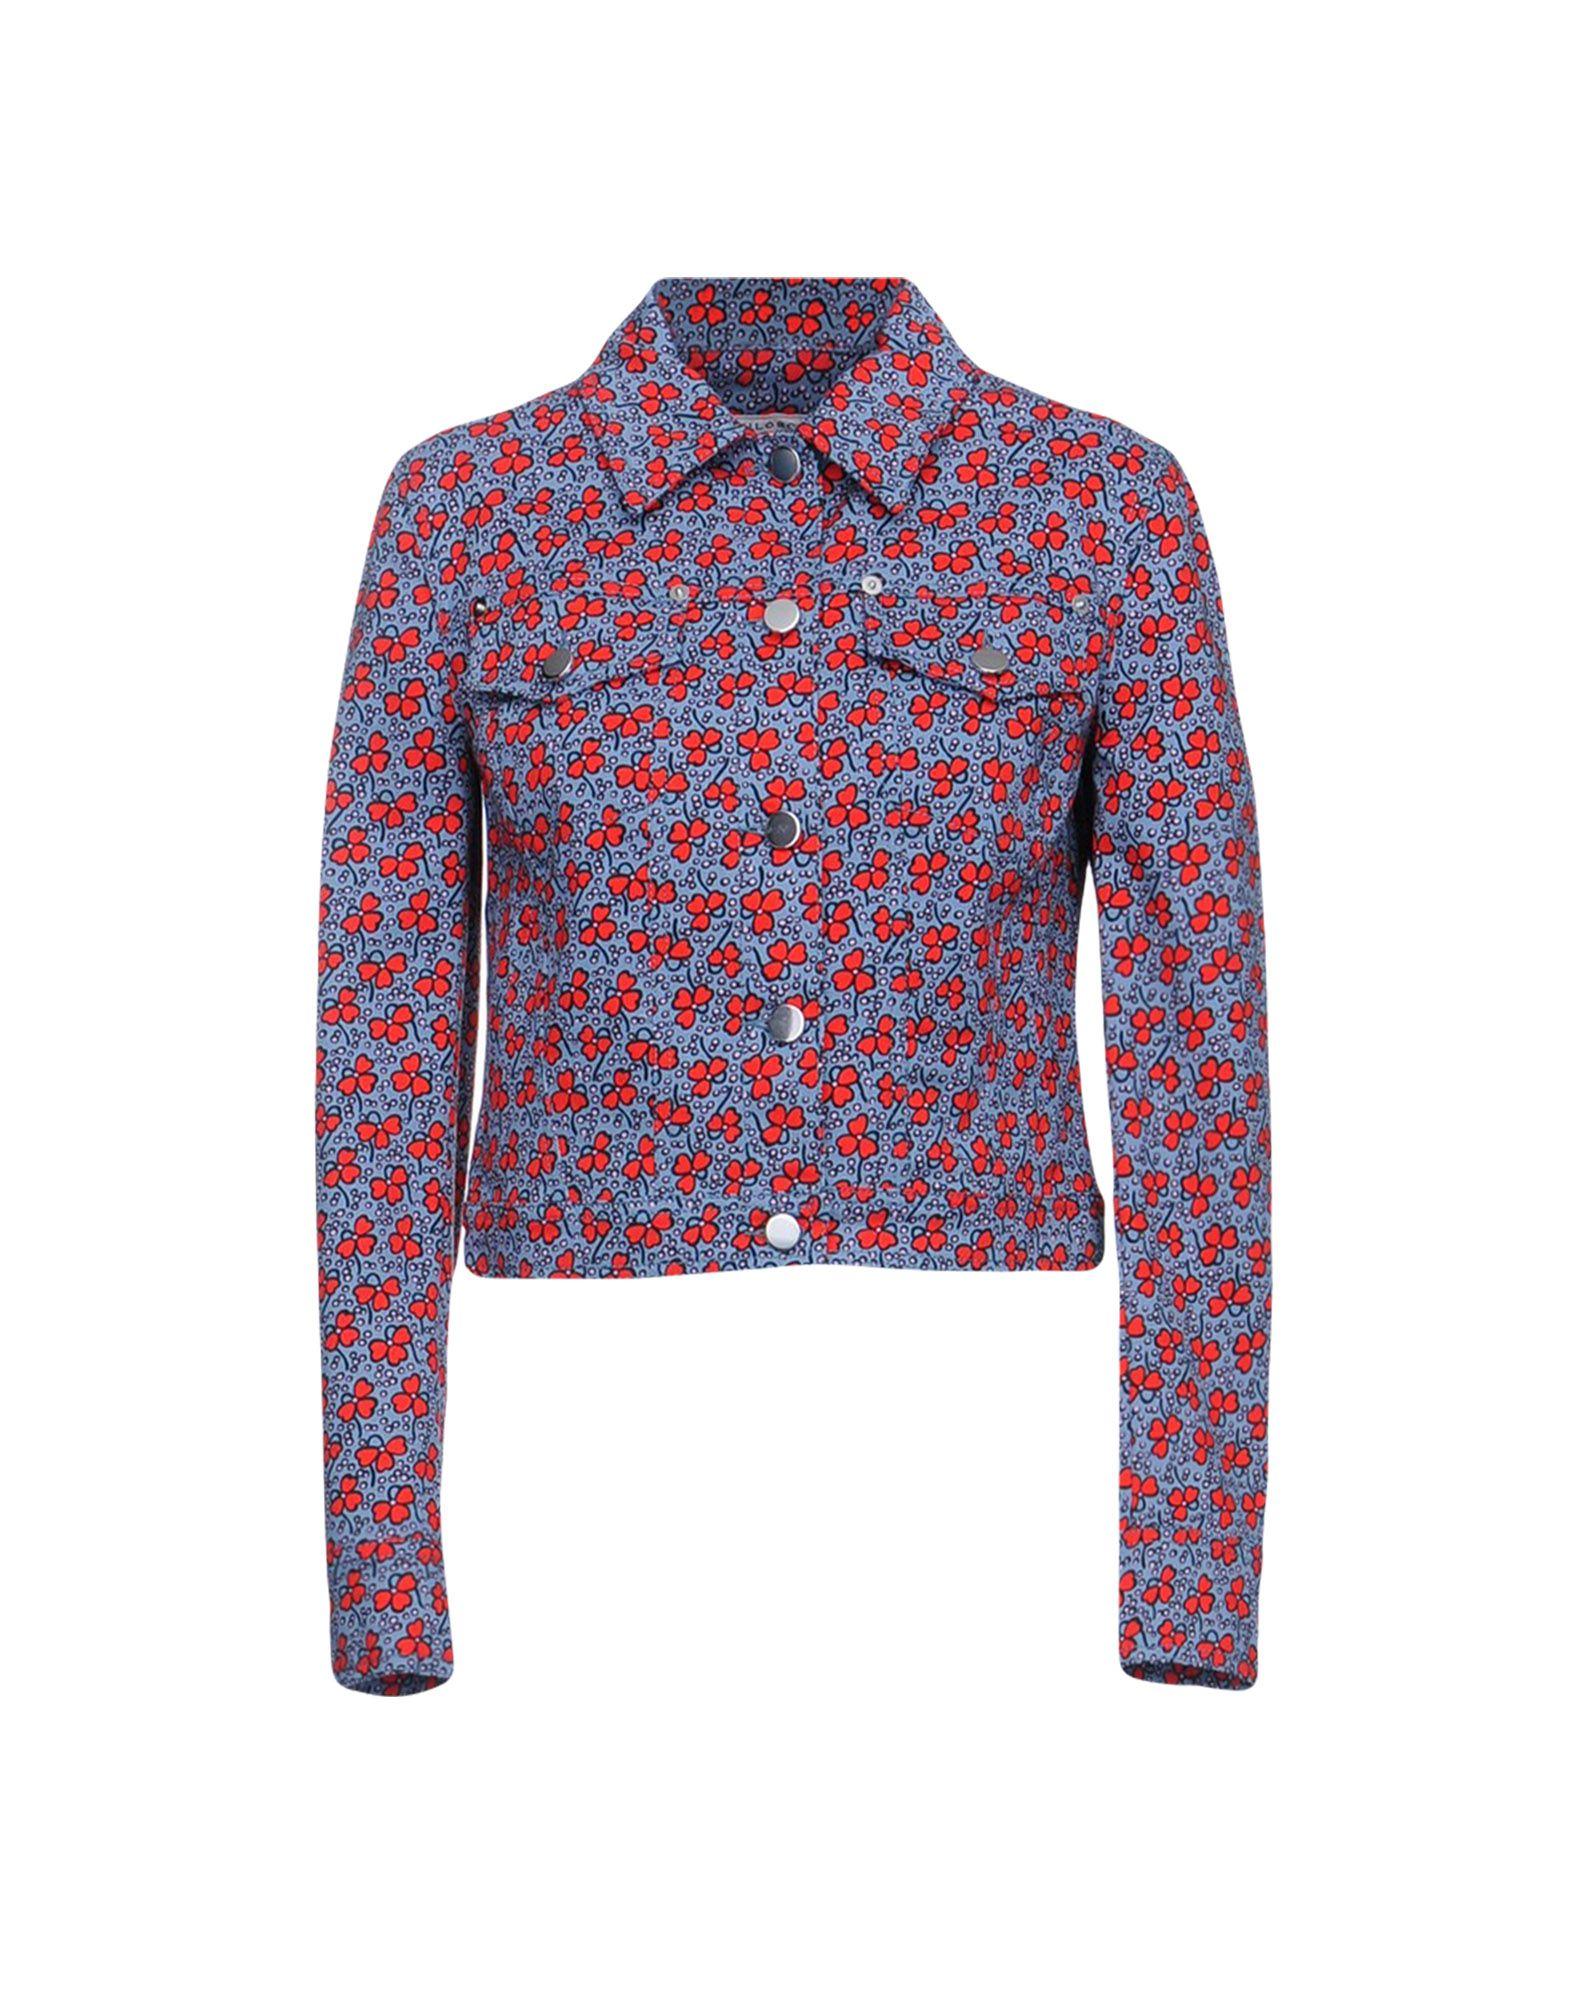 PHILOSOPHY di LORENZO SERAFINI Джинсовая верхняя одежда блуза philosophy di lorenzo serafini голубой